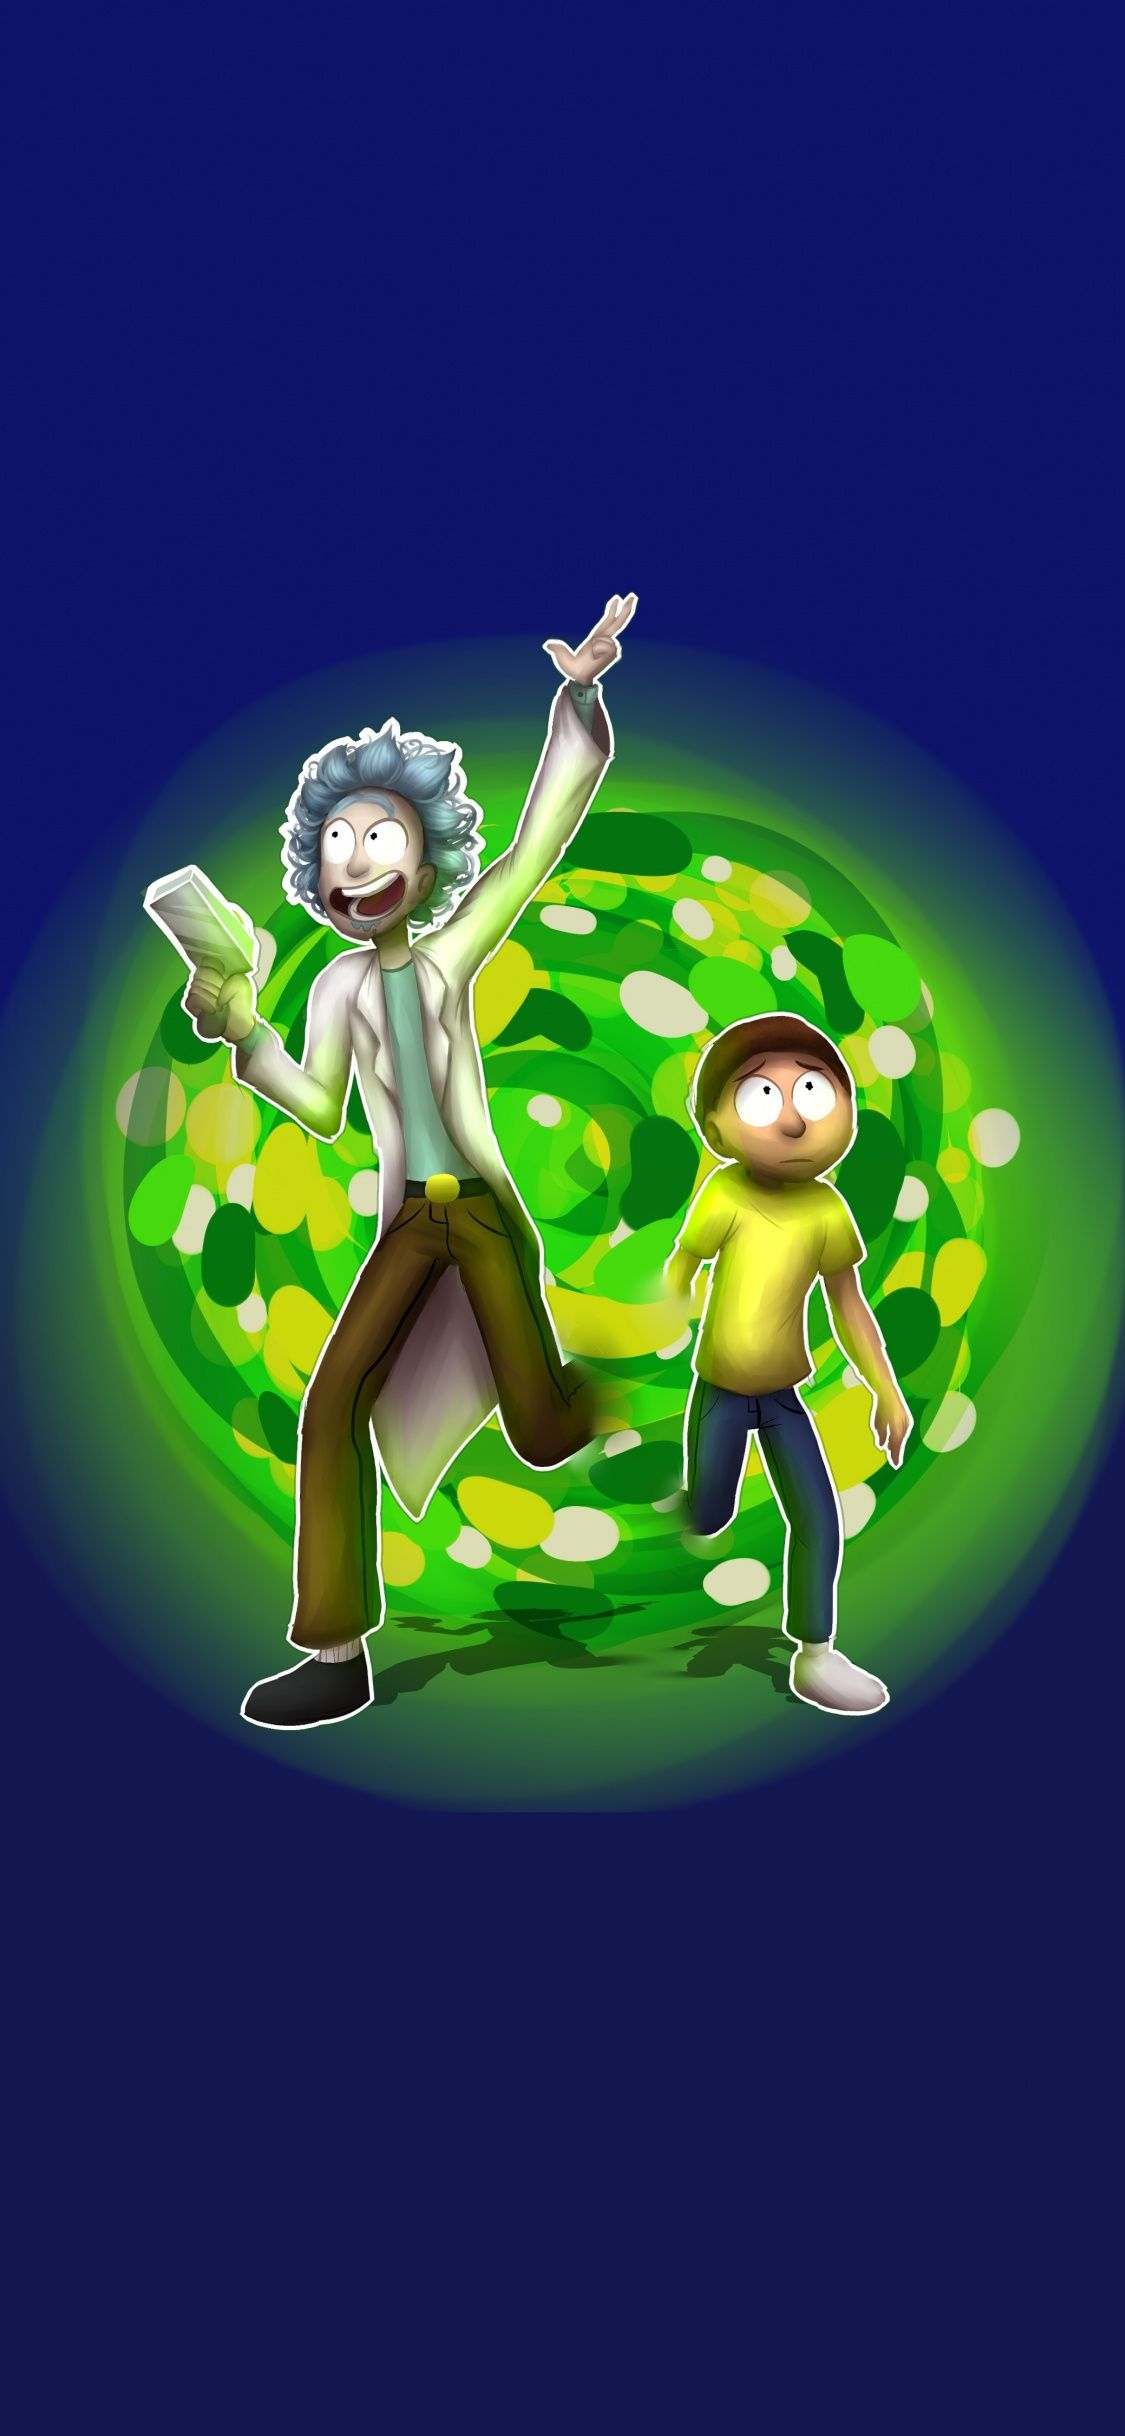 Rick And Morty Run Through Portal Fan Art 1125x2436 Wallpaper Wallpaper Free Hd Wallpapers Hd Wallpaper Rick and morty green portal wallpaper